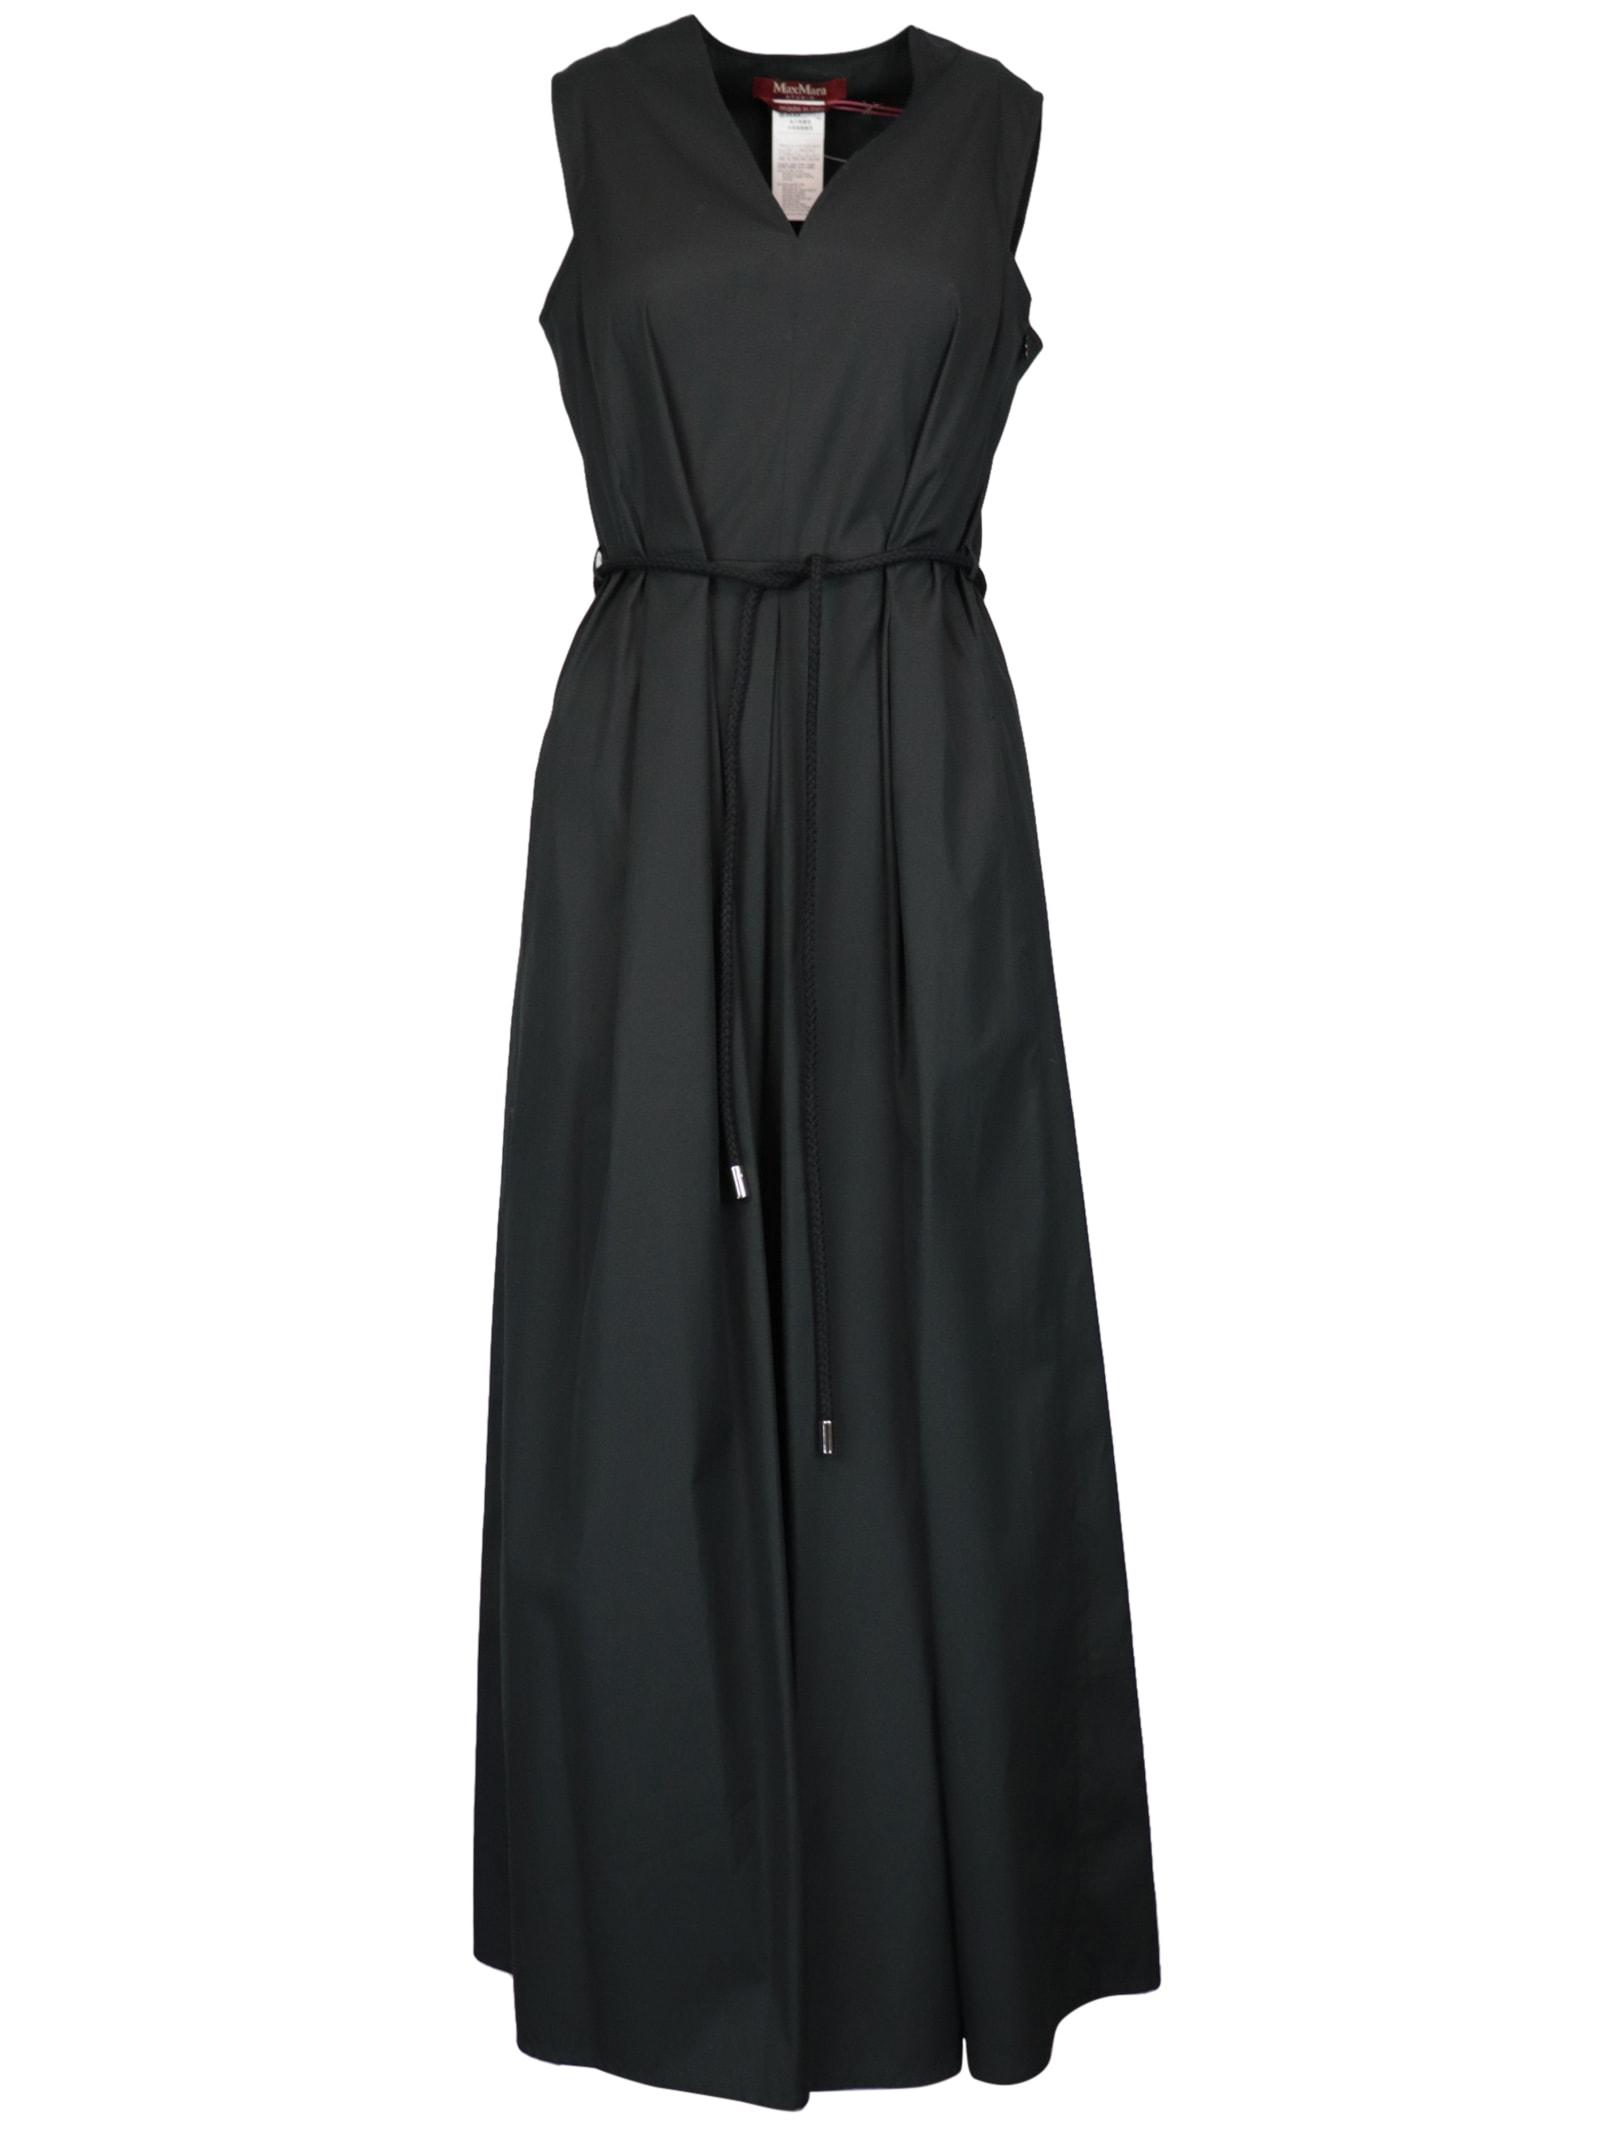 Buy Max Mara Studio Bruna Dress online, shop Max Mara Studio with free shipping